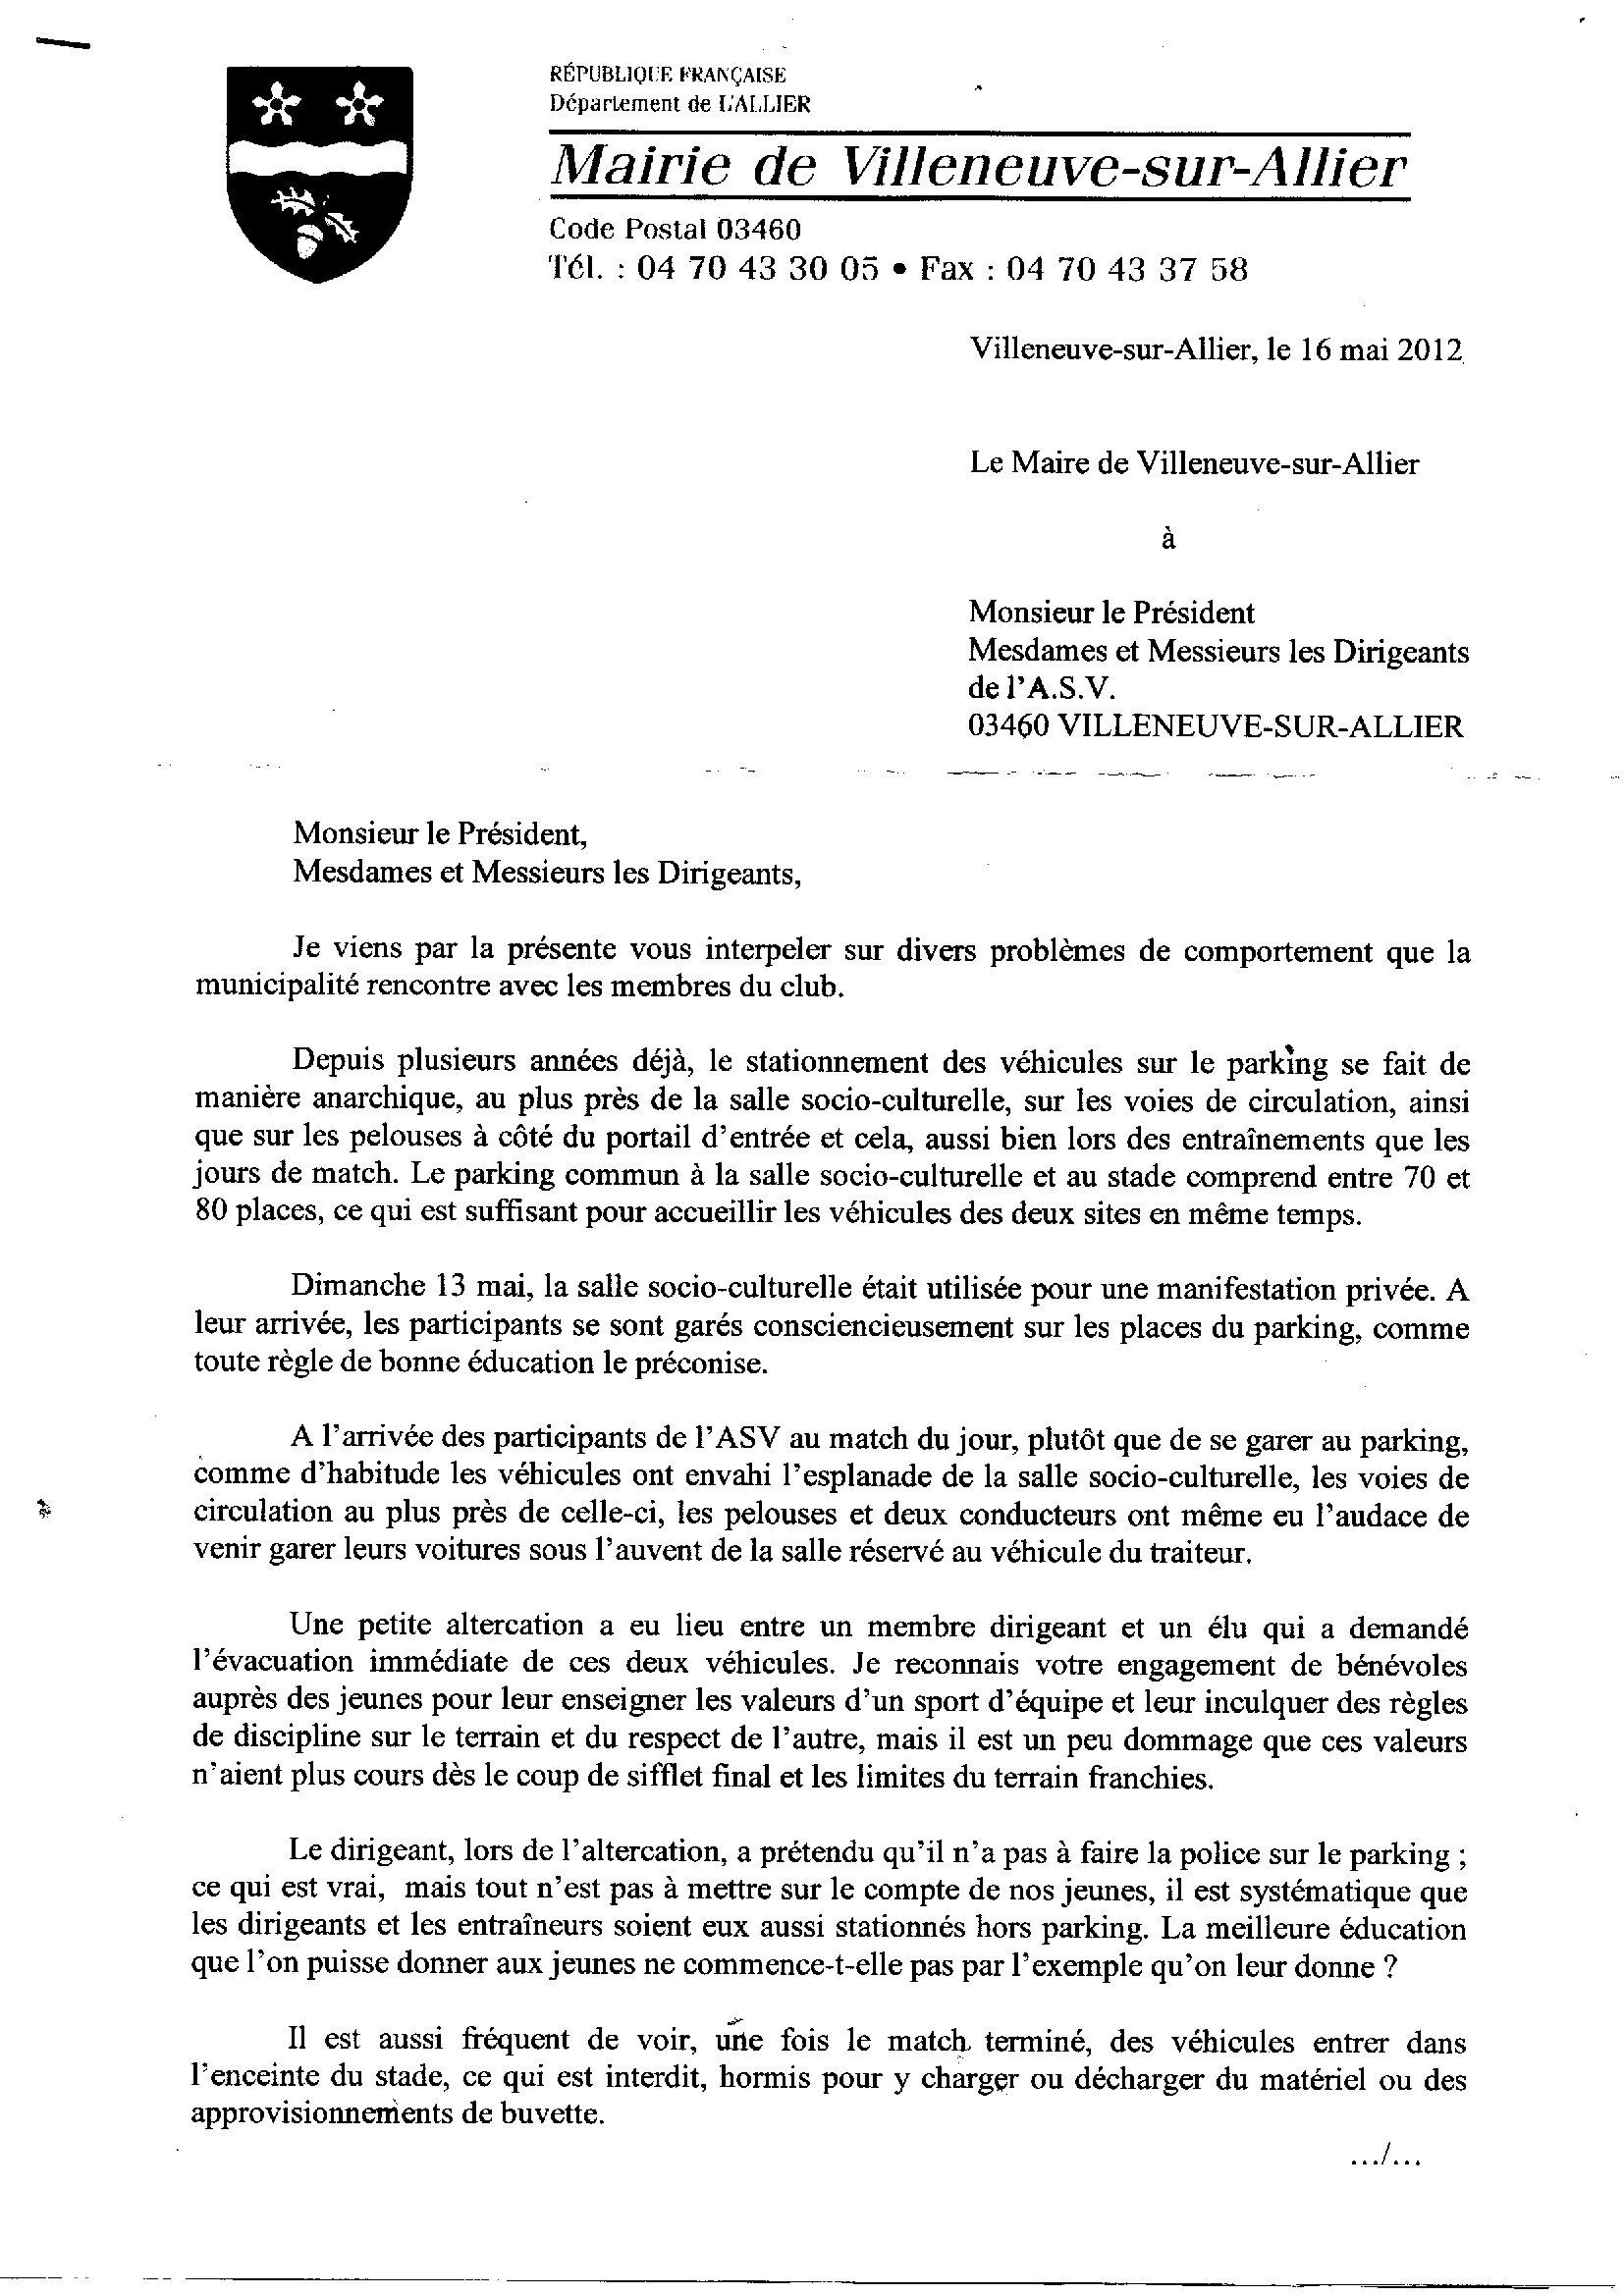 actualit u00e9 - lettre de la mairie  u00e0 l u0026 39 asv